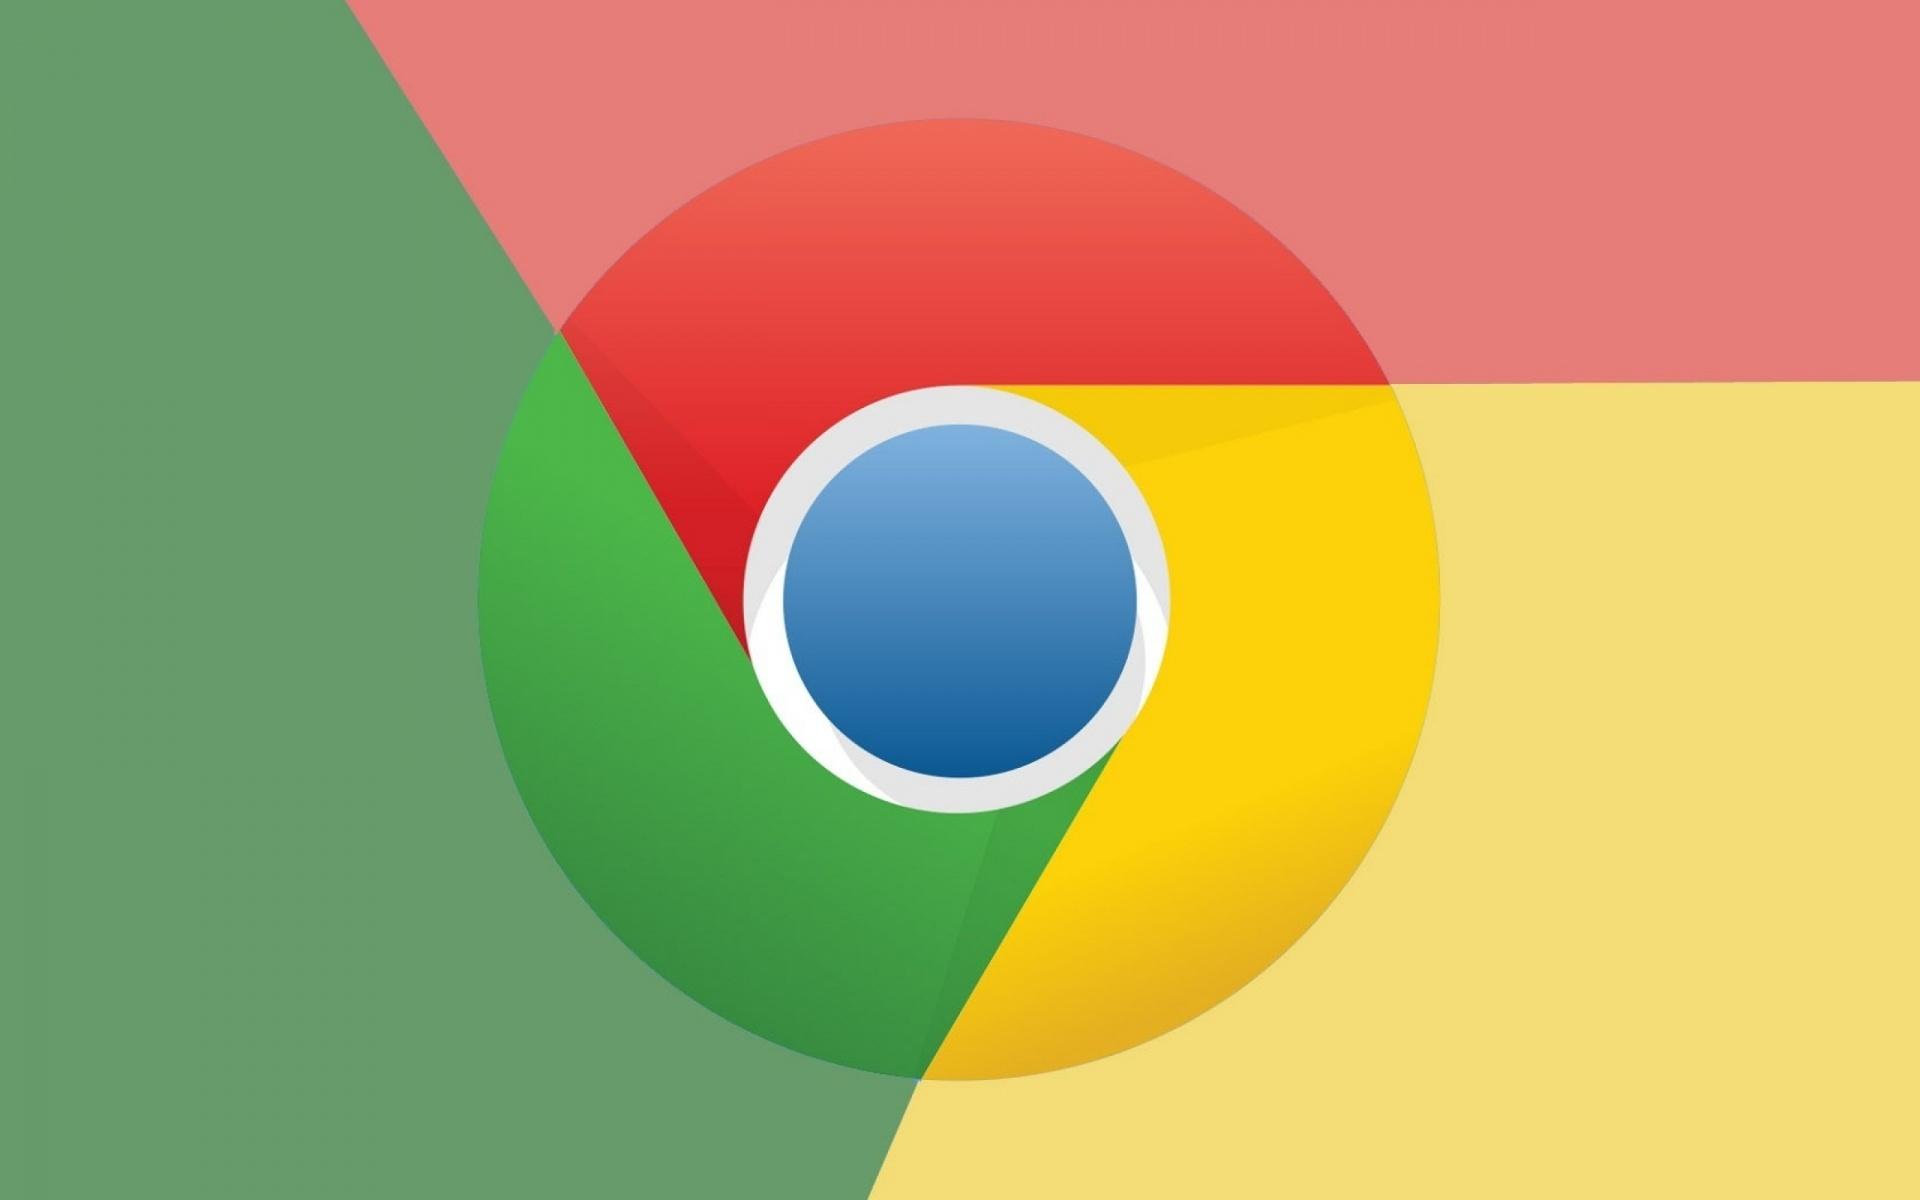 Google chrome themes quotes - Fresh Google Chrome Logo Wallpapers 1920x1200 146100